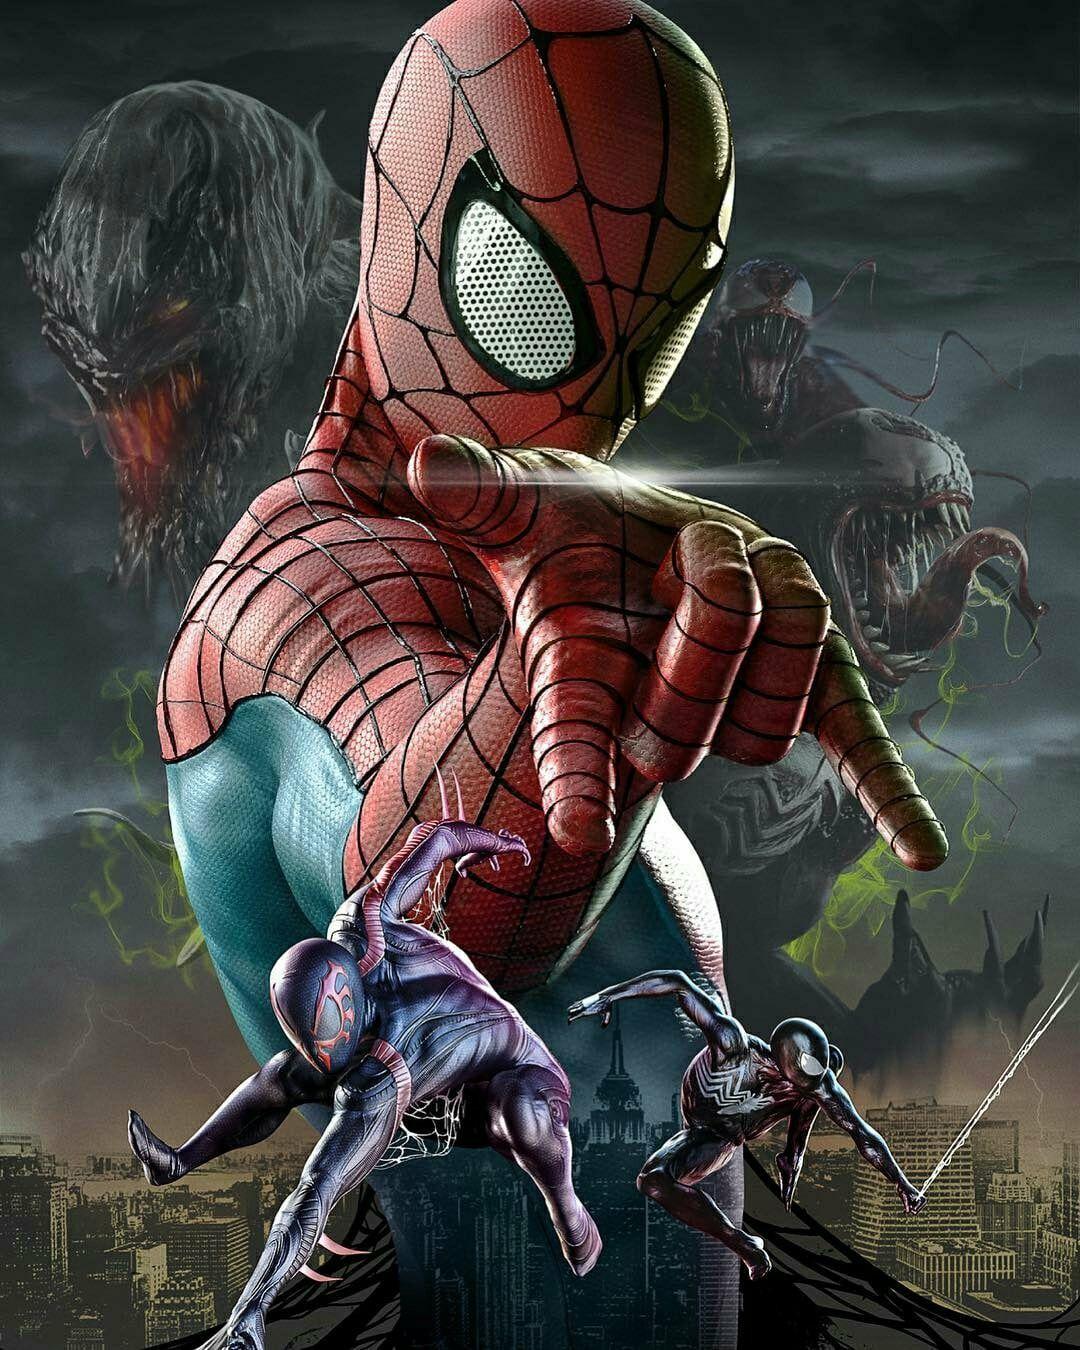 Takagi Gosei Fixw 234 Jpg 234 333 Spiderman Art Spiderman Artwork Amazing Spider